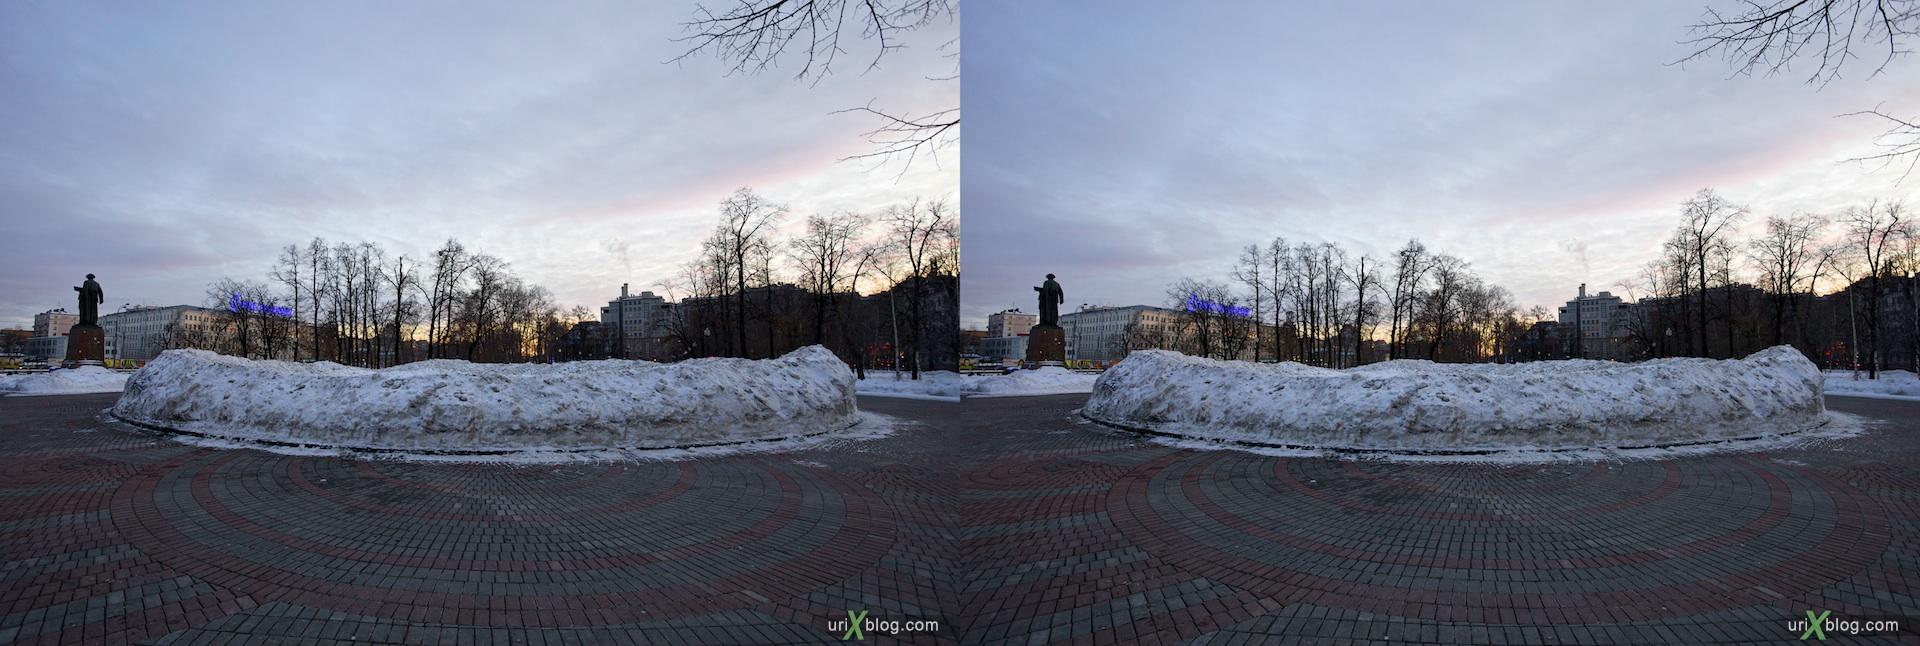 2011 Москва Болотная площадь, 3D, фонтан стерео стереопара 3Д 3D stereo cross-view